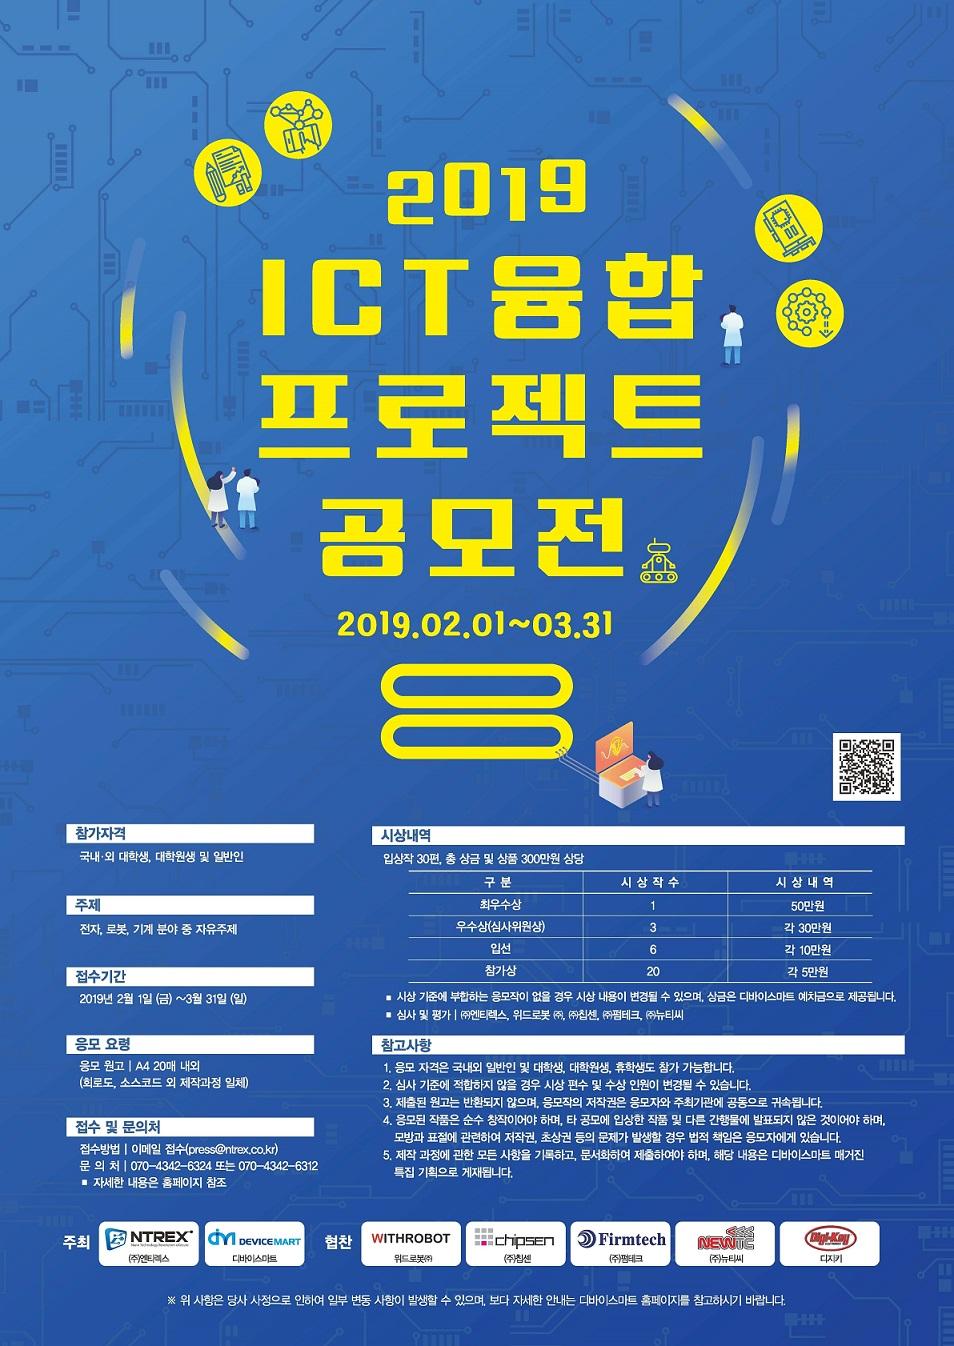 2019 iCT 융합 프로젝트 공모전